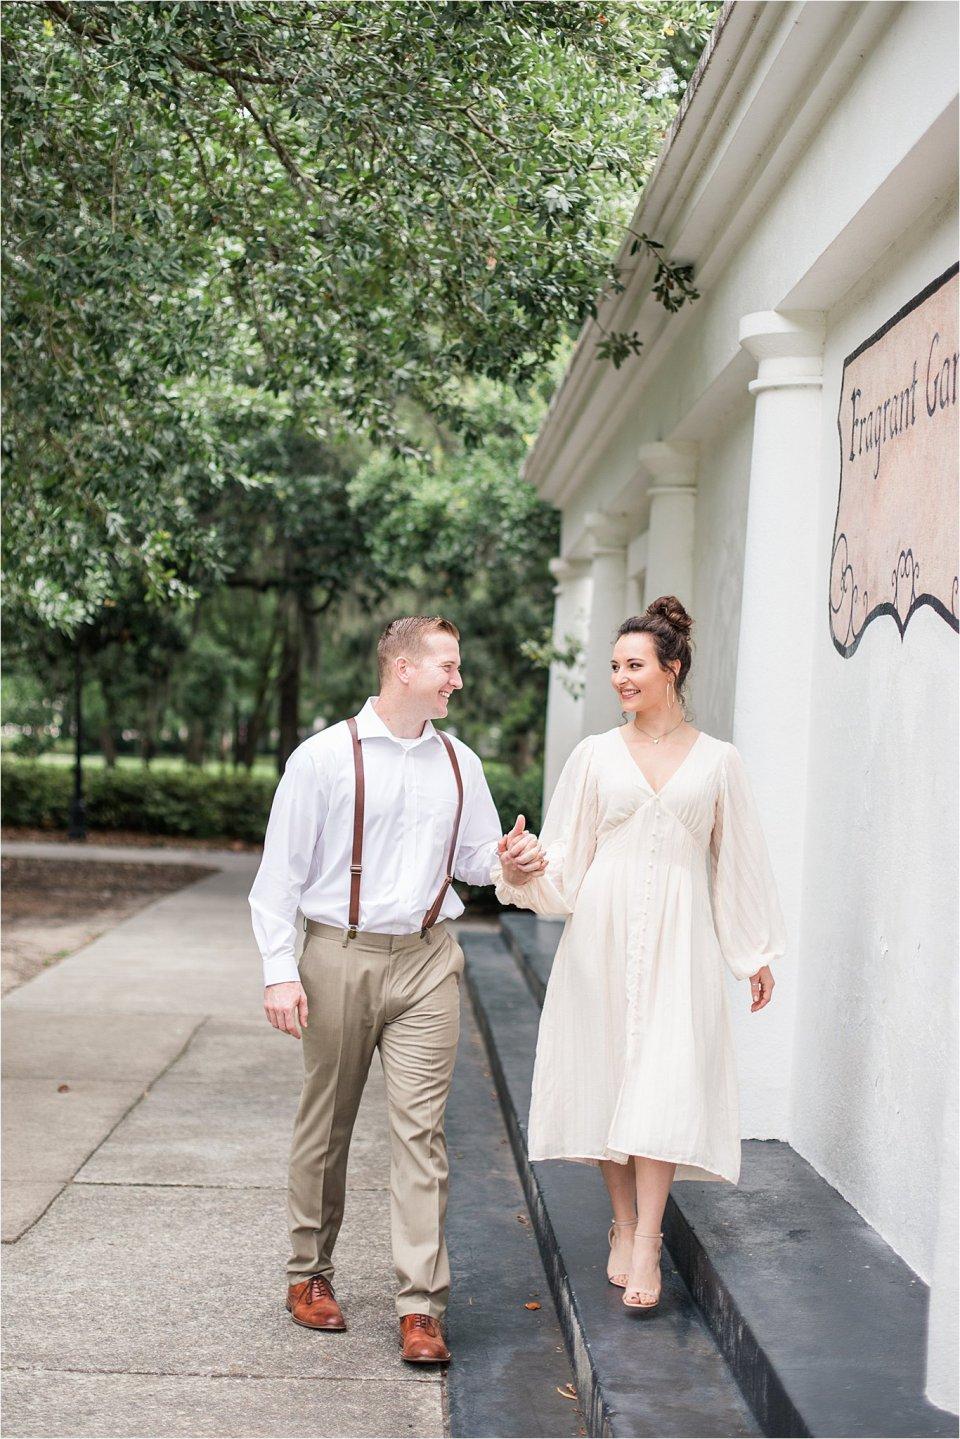 Couple in Forsyth Park in Savannah, GA by destination photographer Karen Shoufler